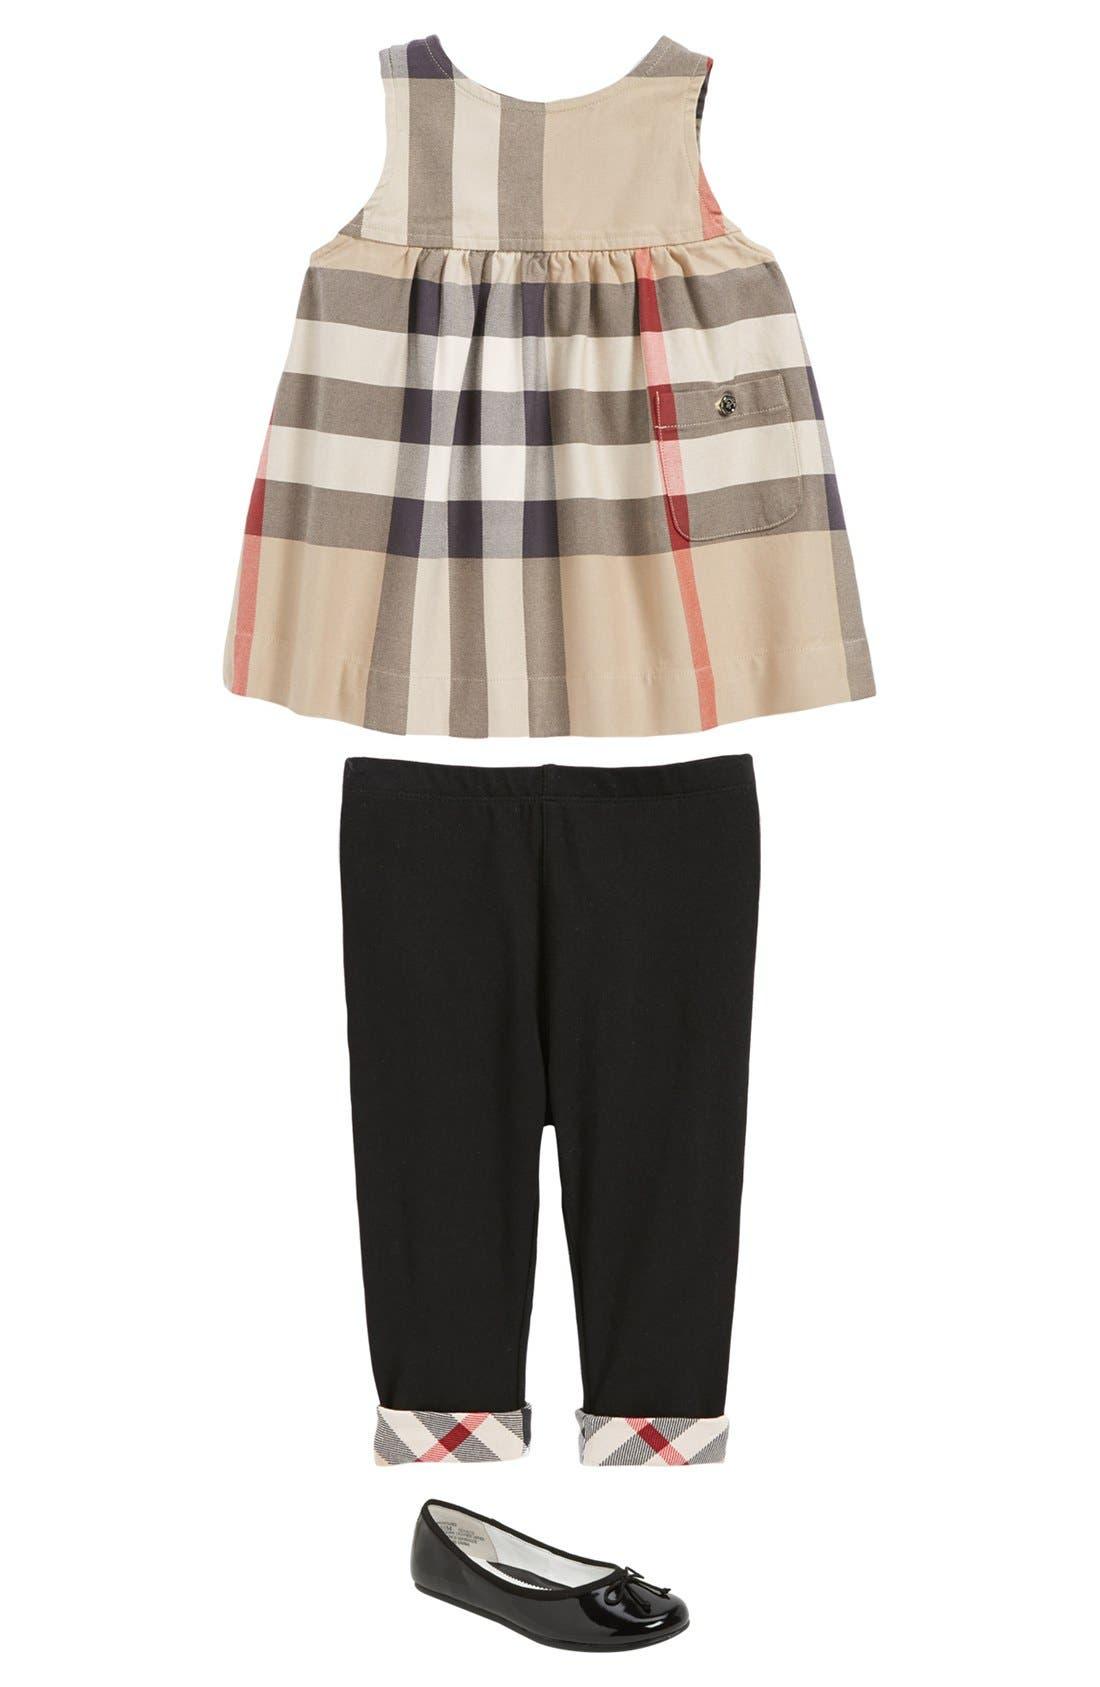 Main Image - Burberry Dress, Pants & Nordstrom Flat (Baby Girls)